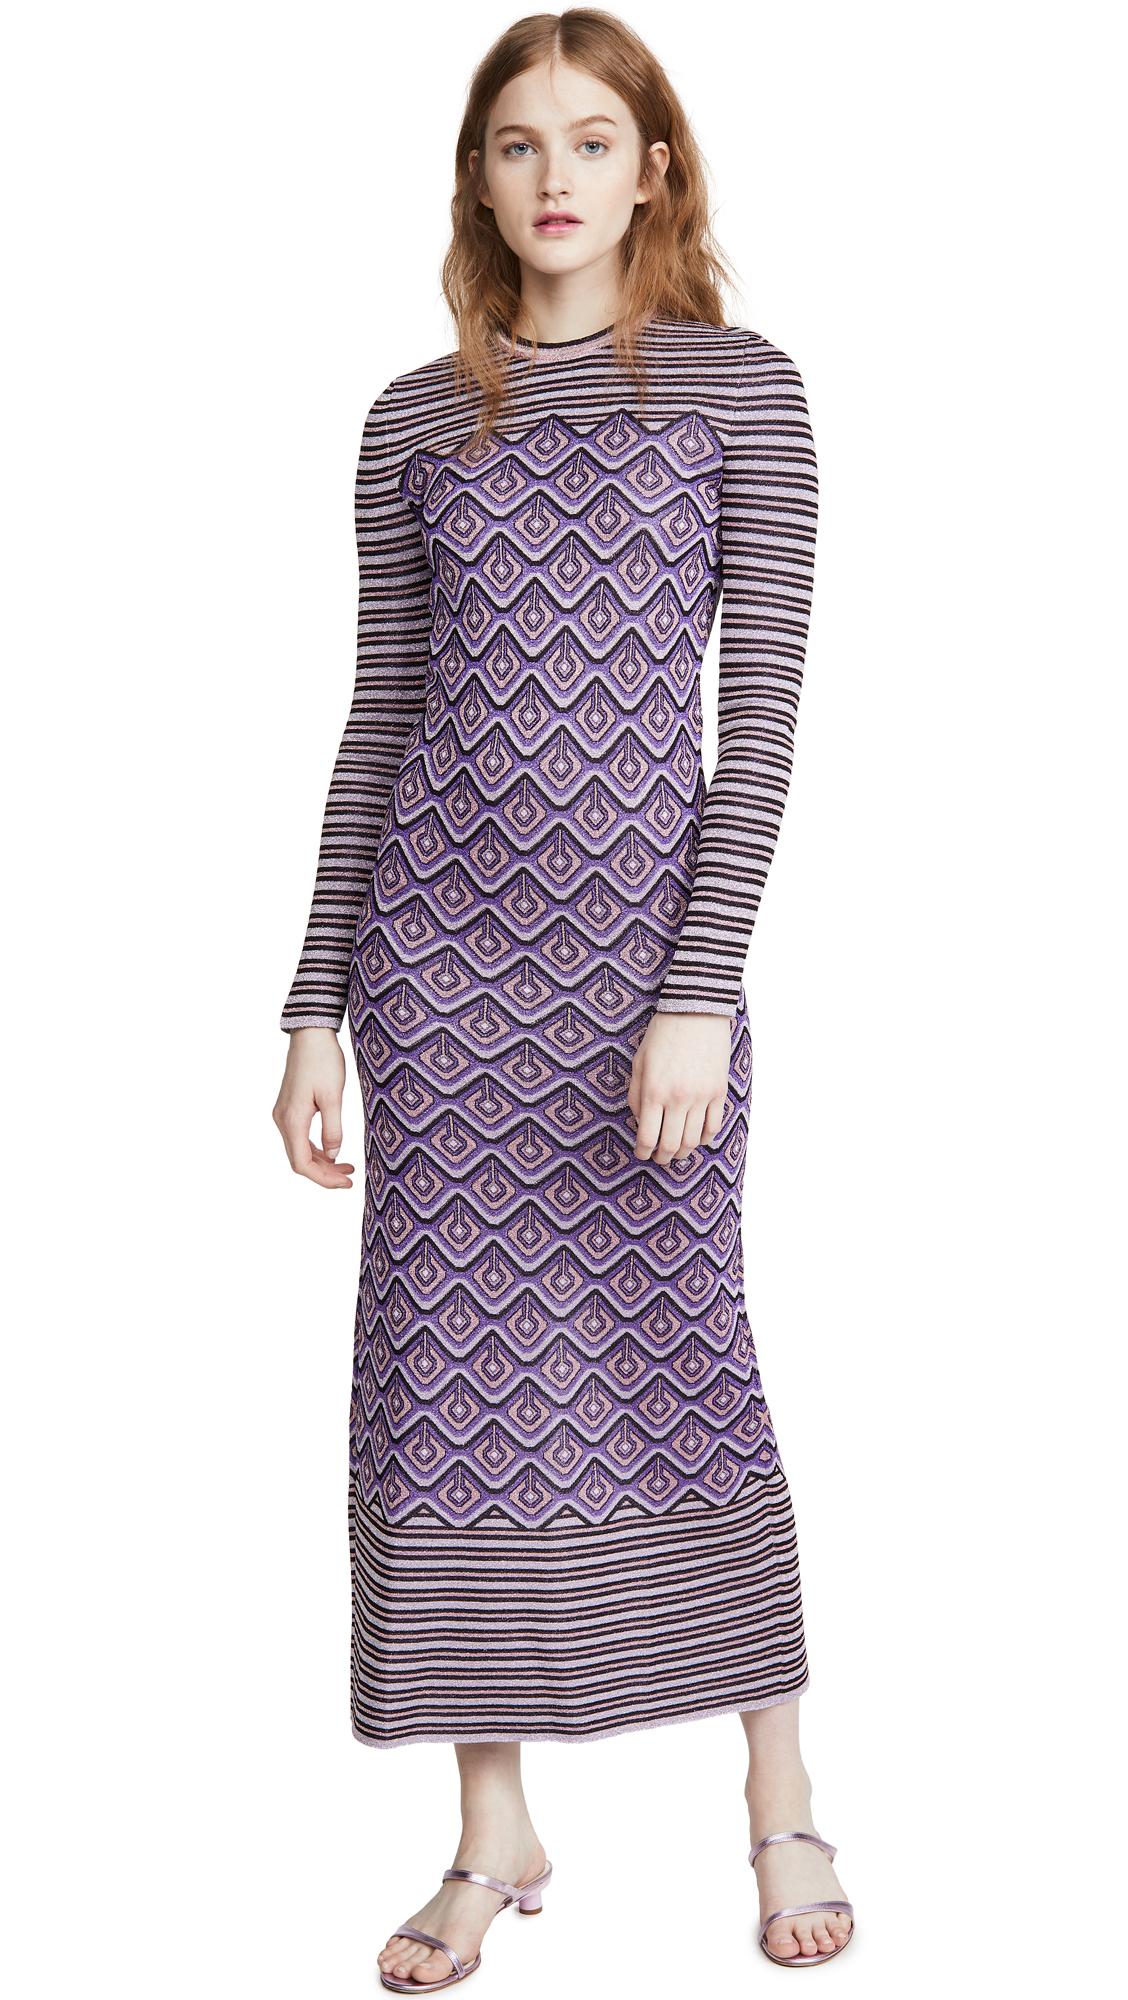 Buy Paco Rabanne Metallic Jacquard Stripes and Argyle Dress online beautiful Paco Rabanne Clothing, Dresses